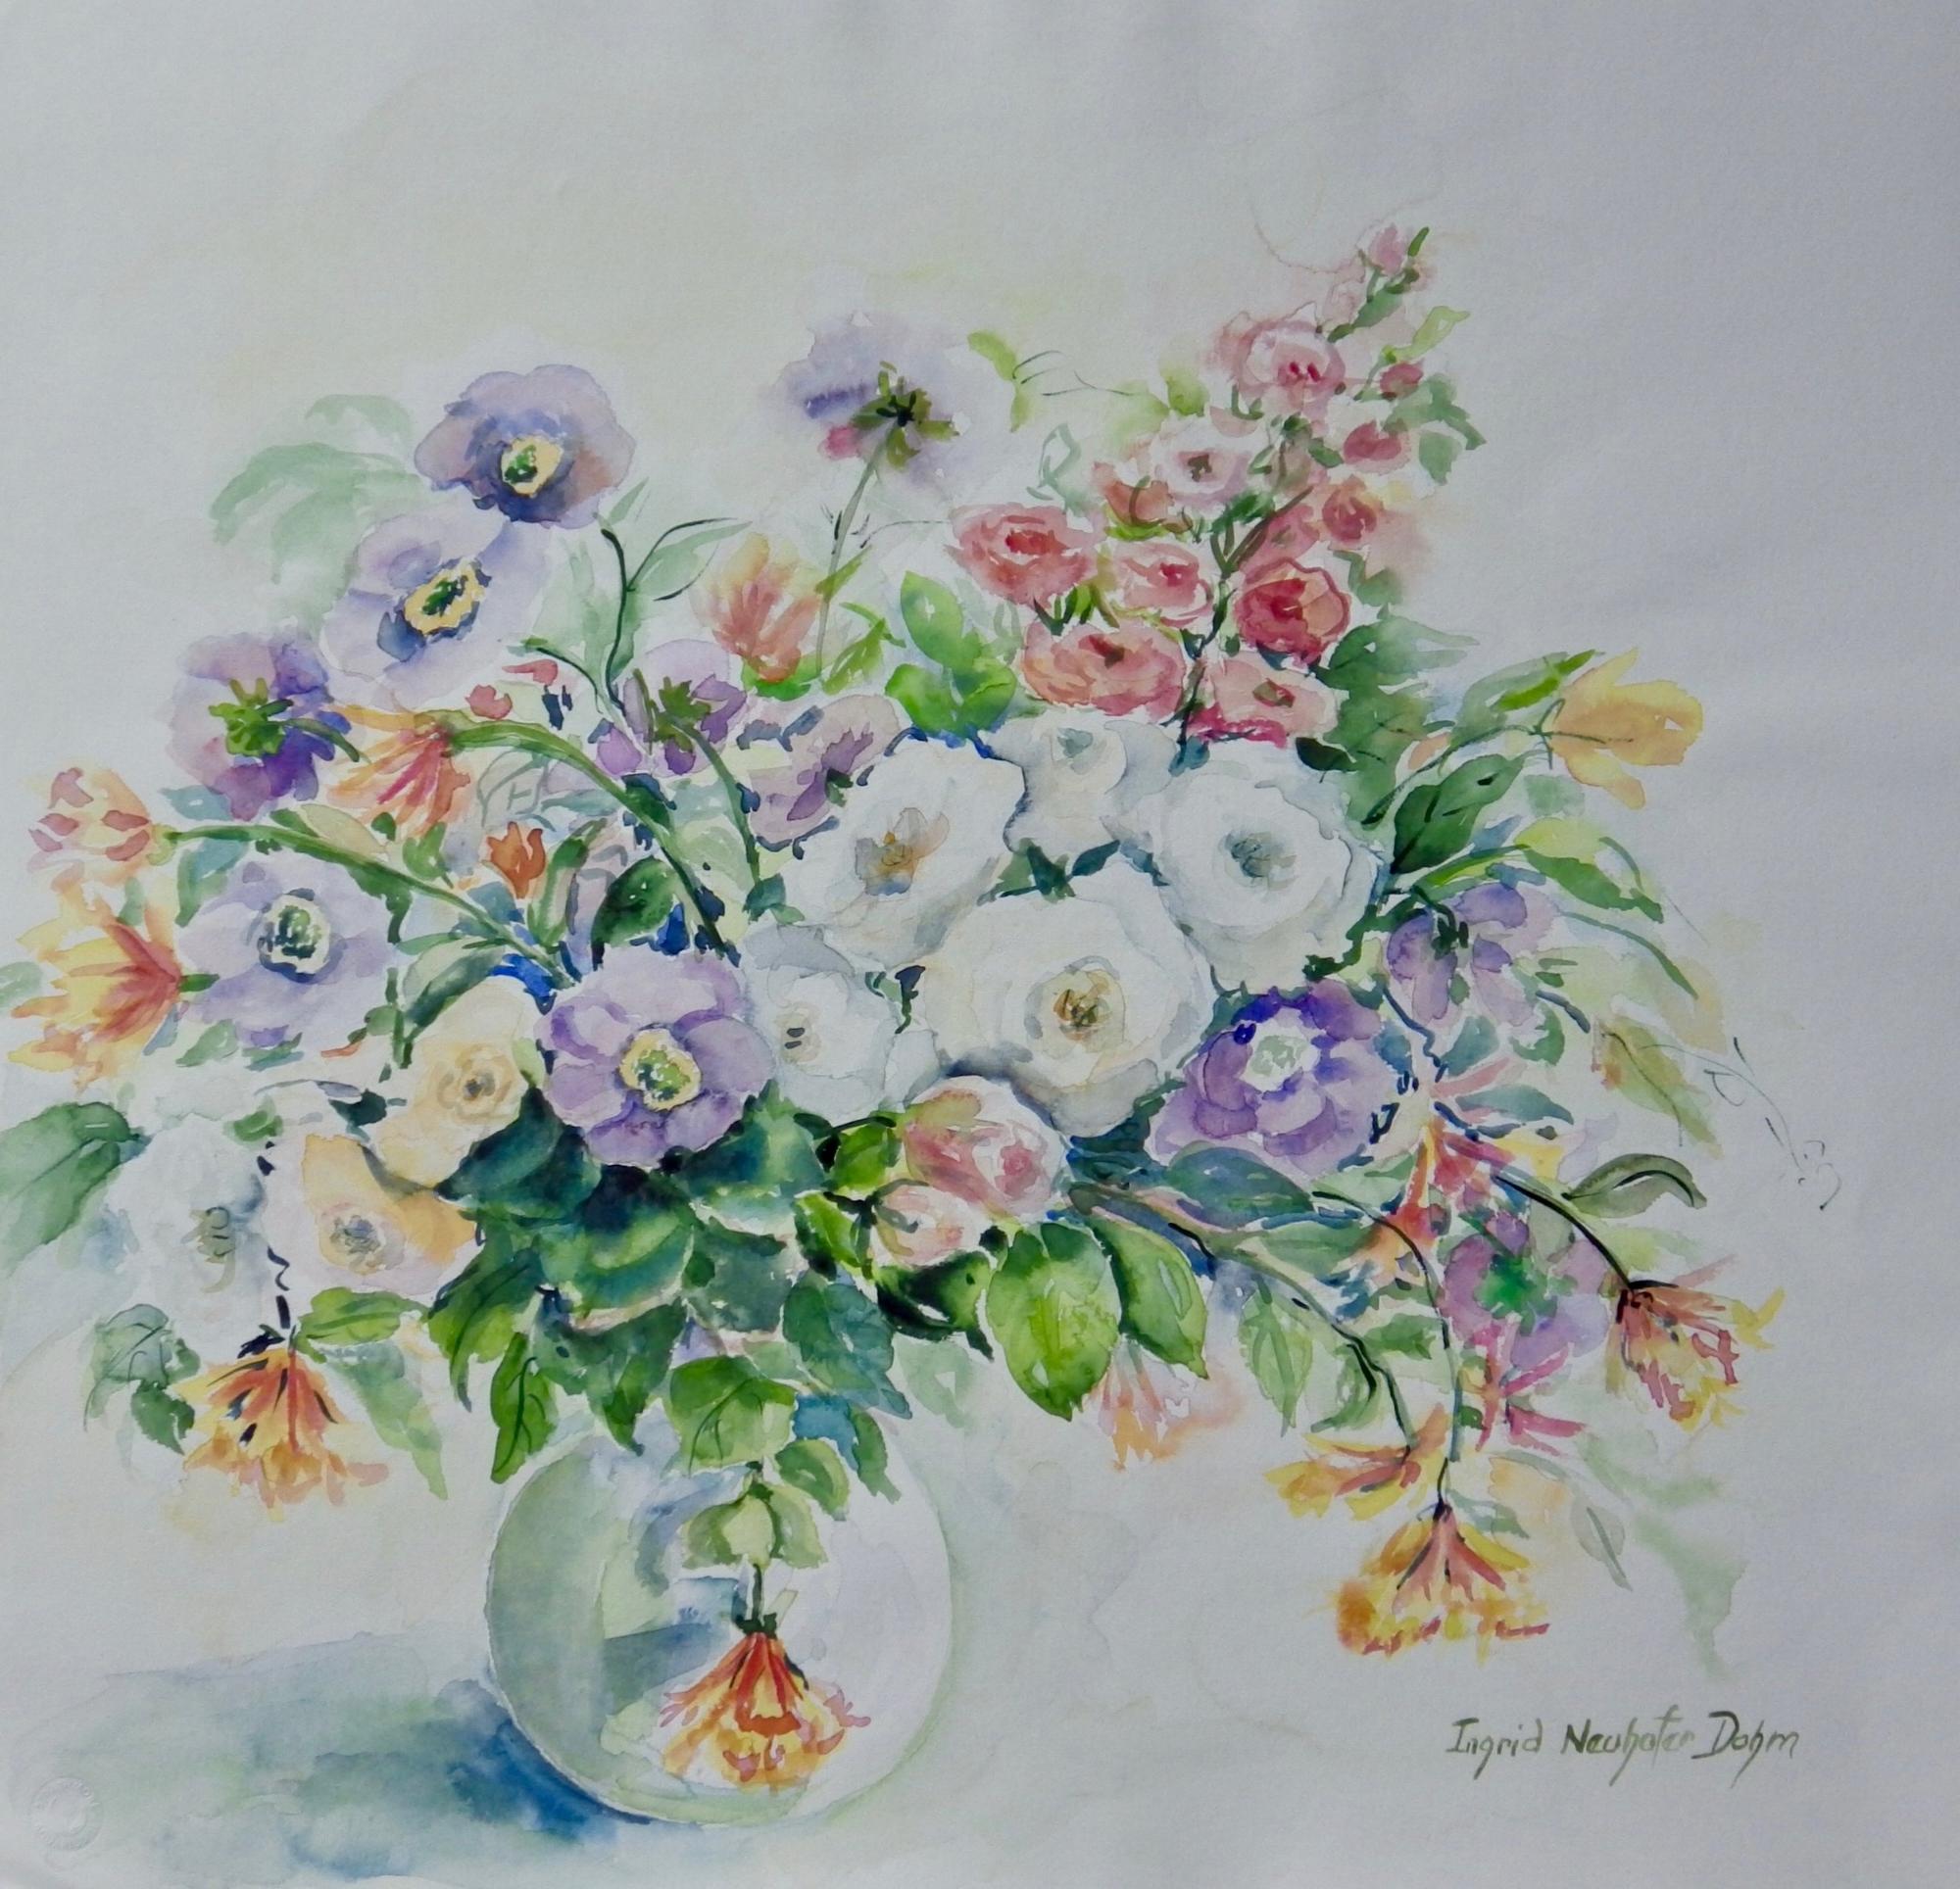 Ingrid Neuhofer Dohm Floral Arrangement.jpg